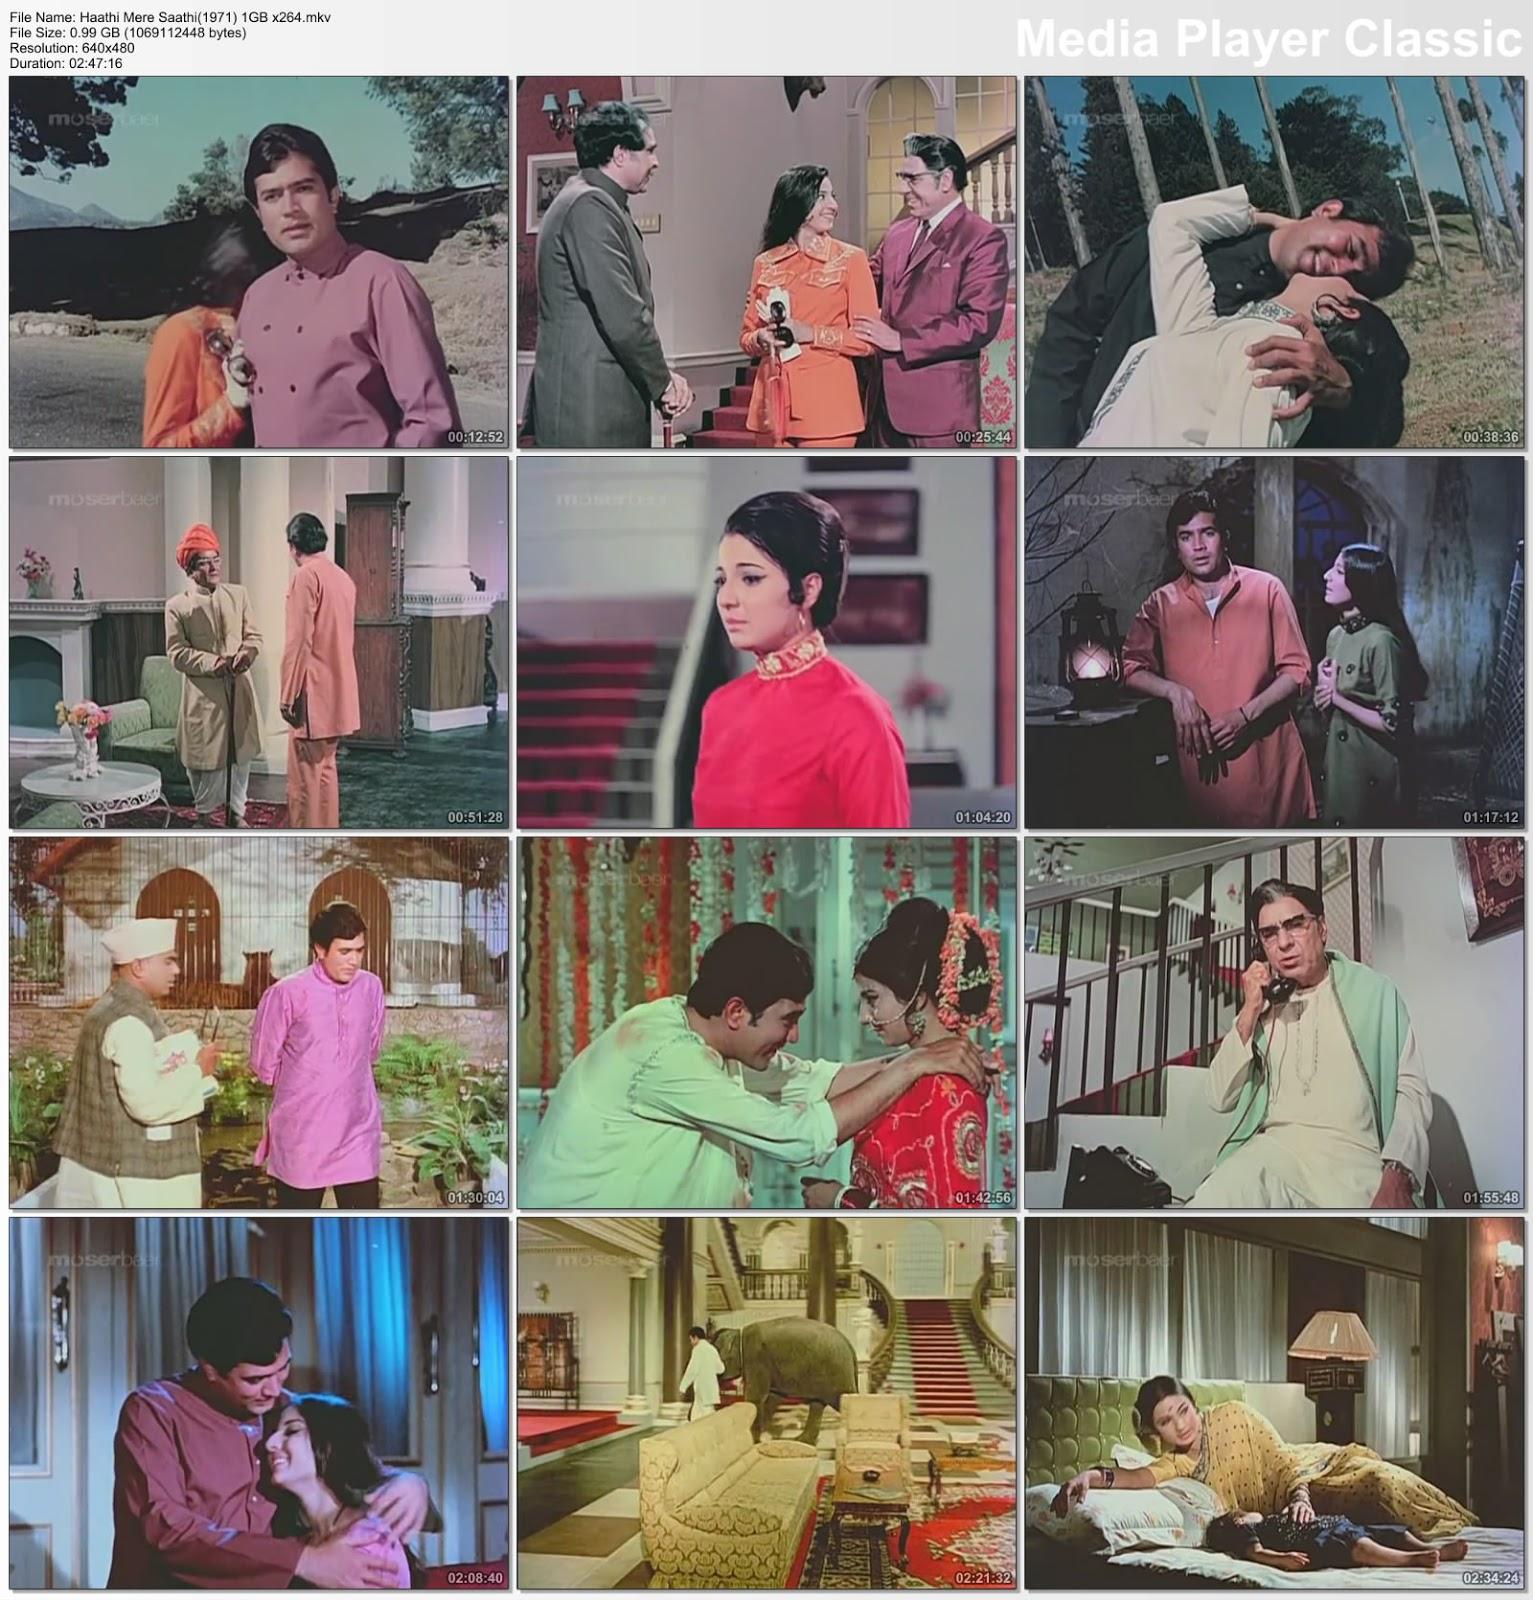 CINE HINDU: Haathi Mere Saathi (1971